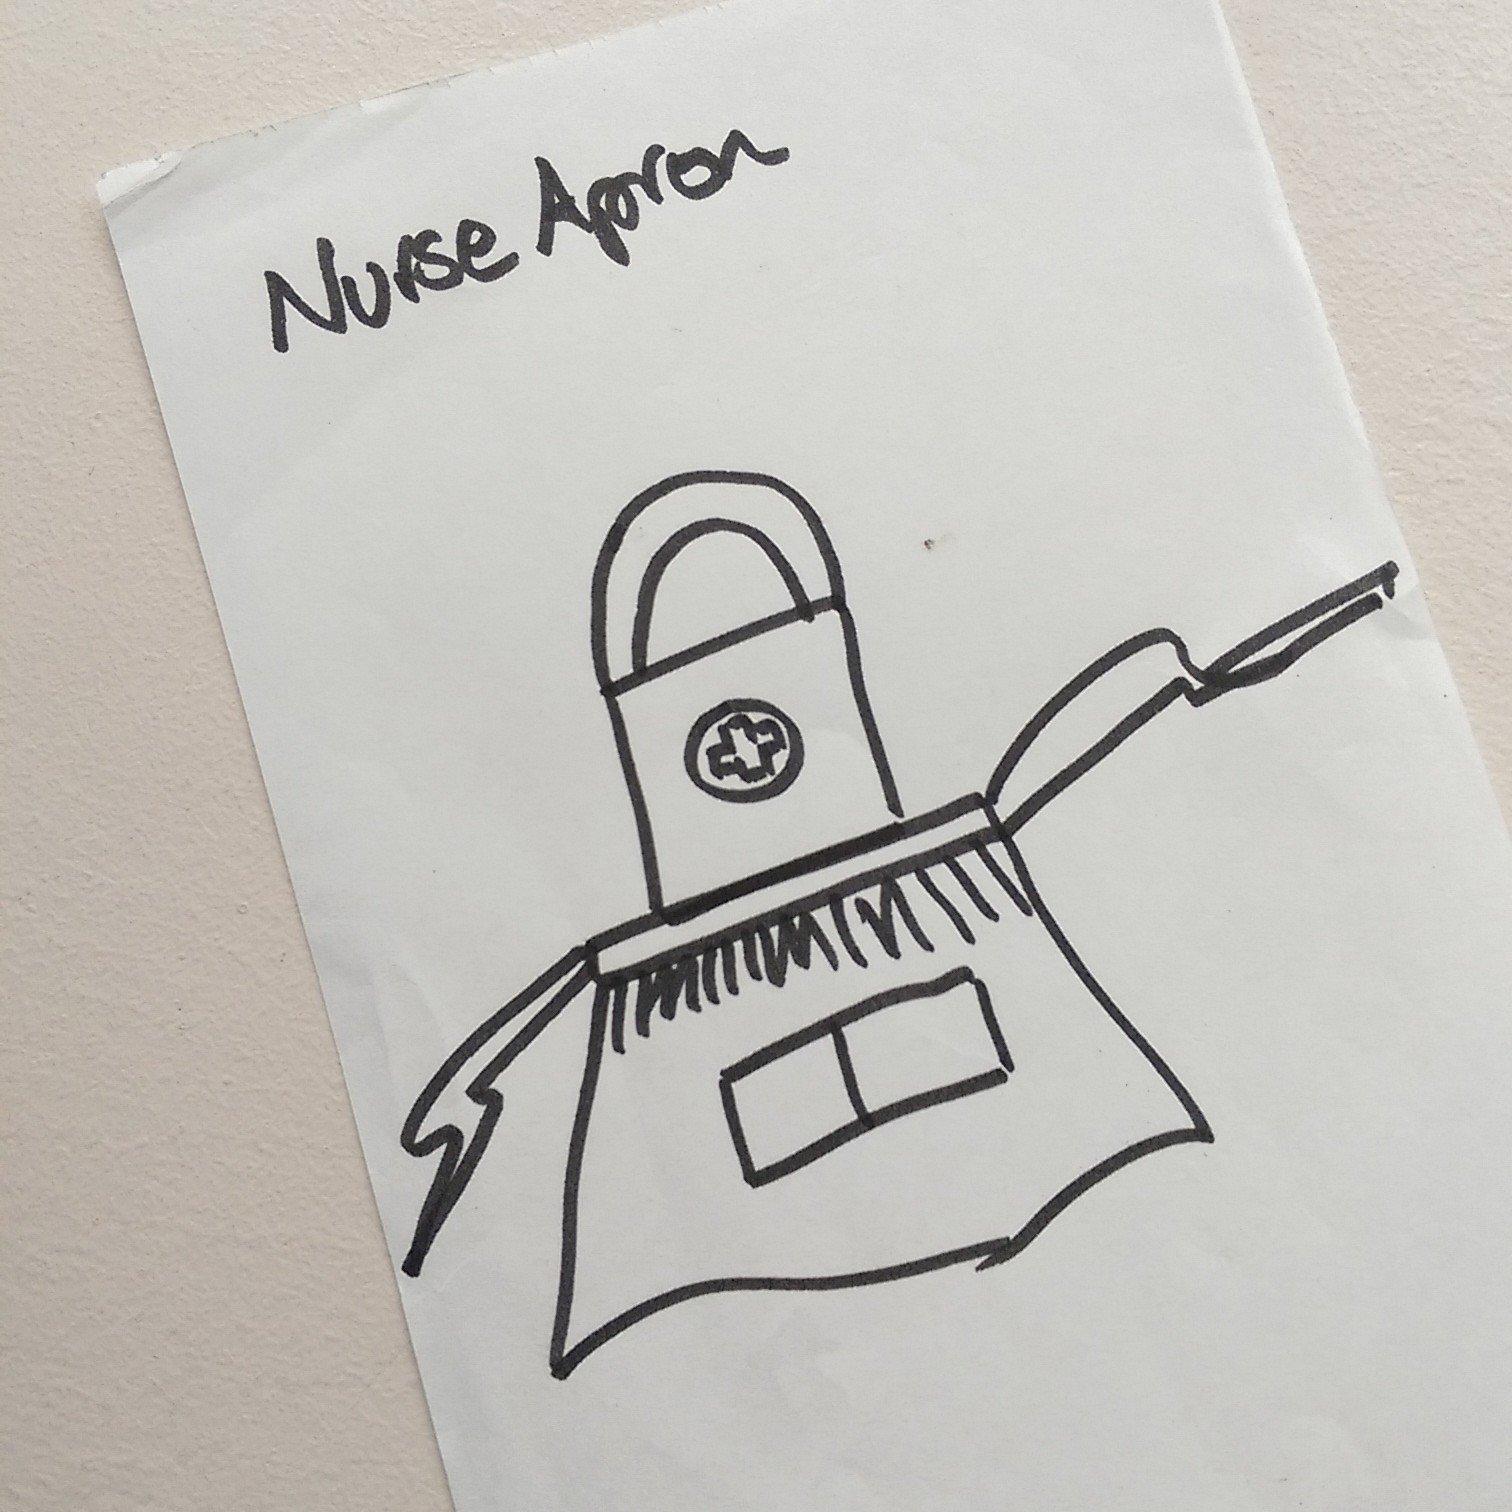 Nurse Apron initial sketch